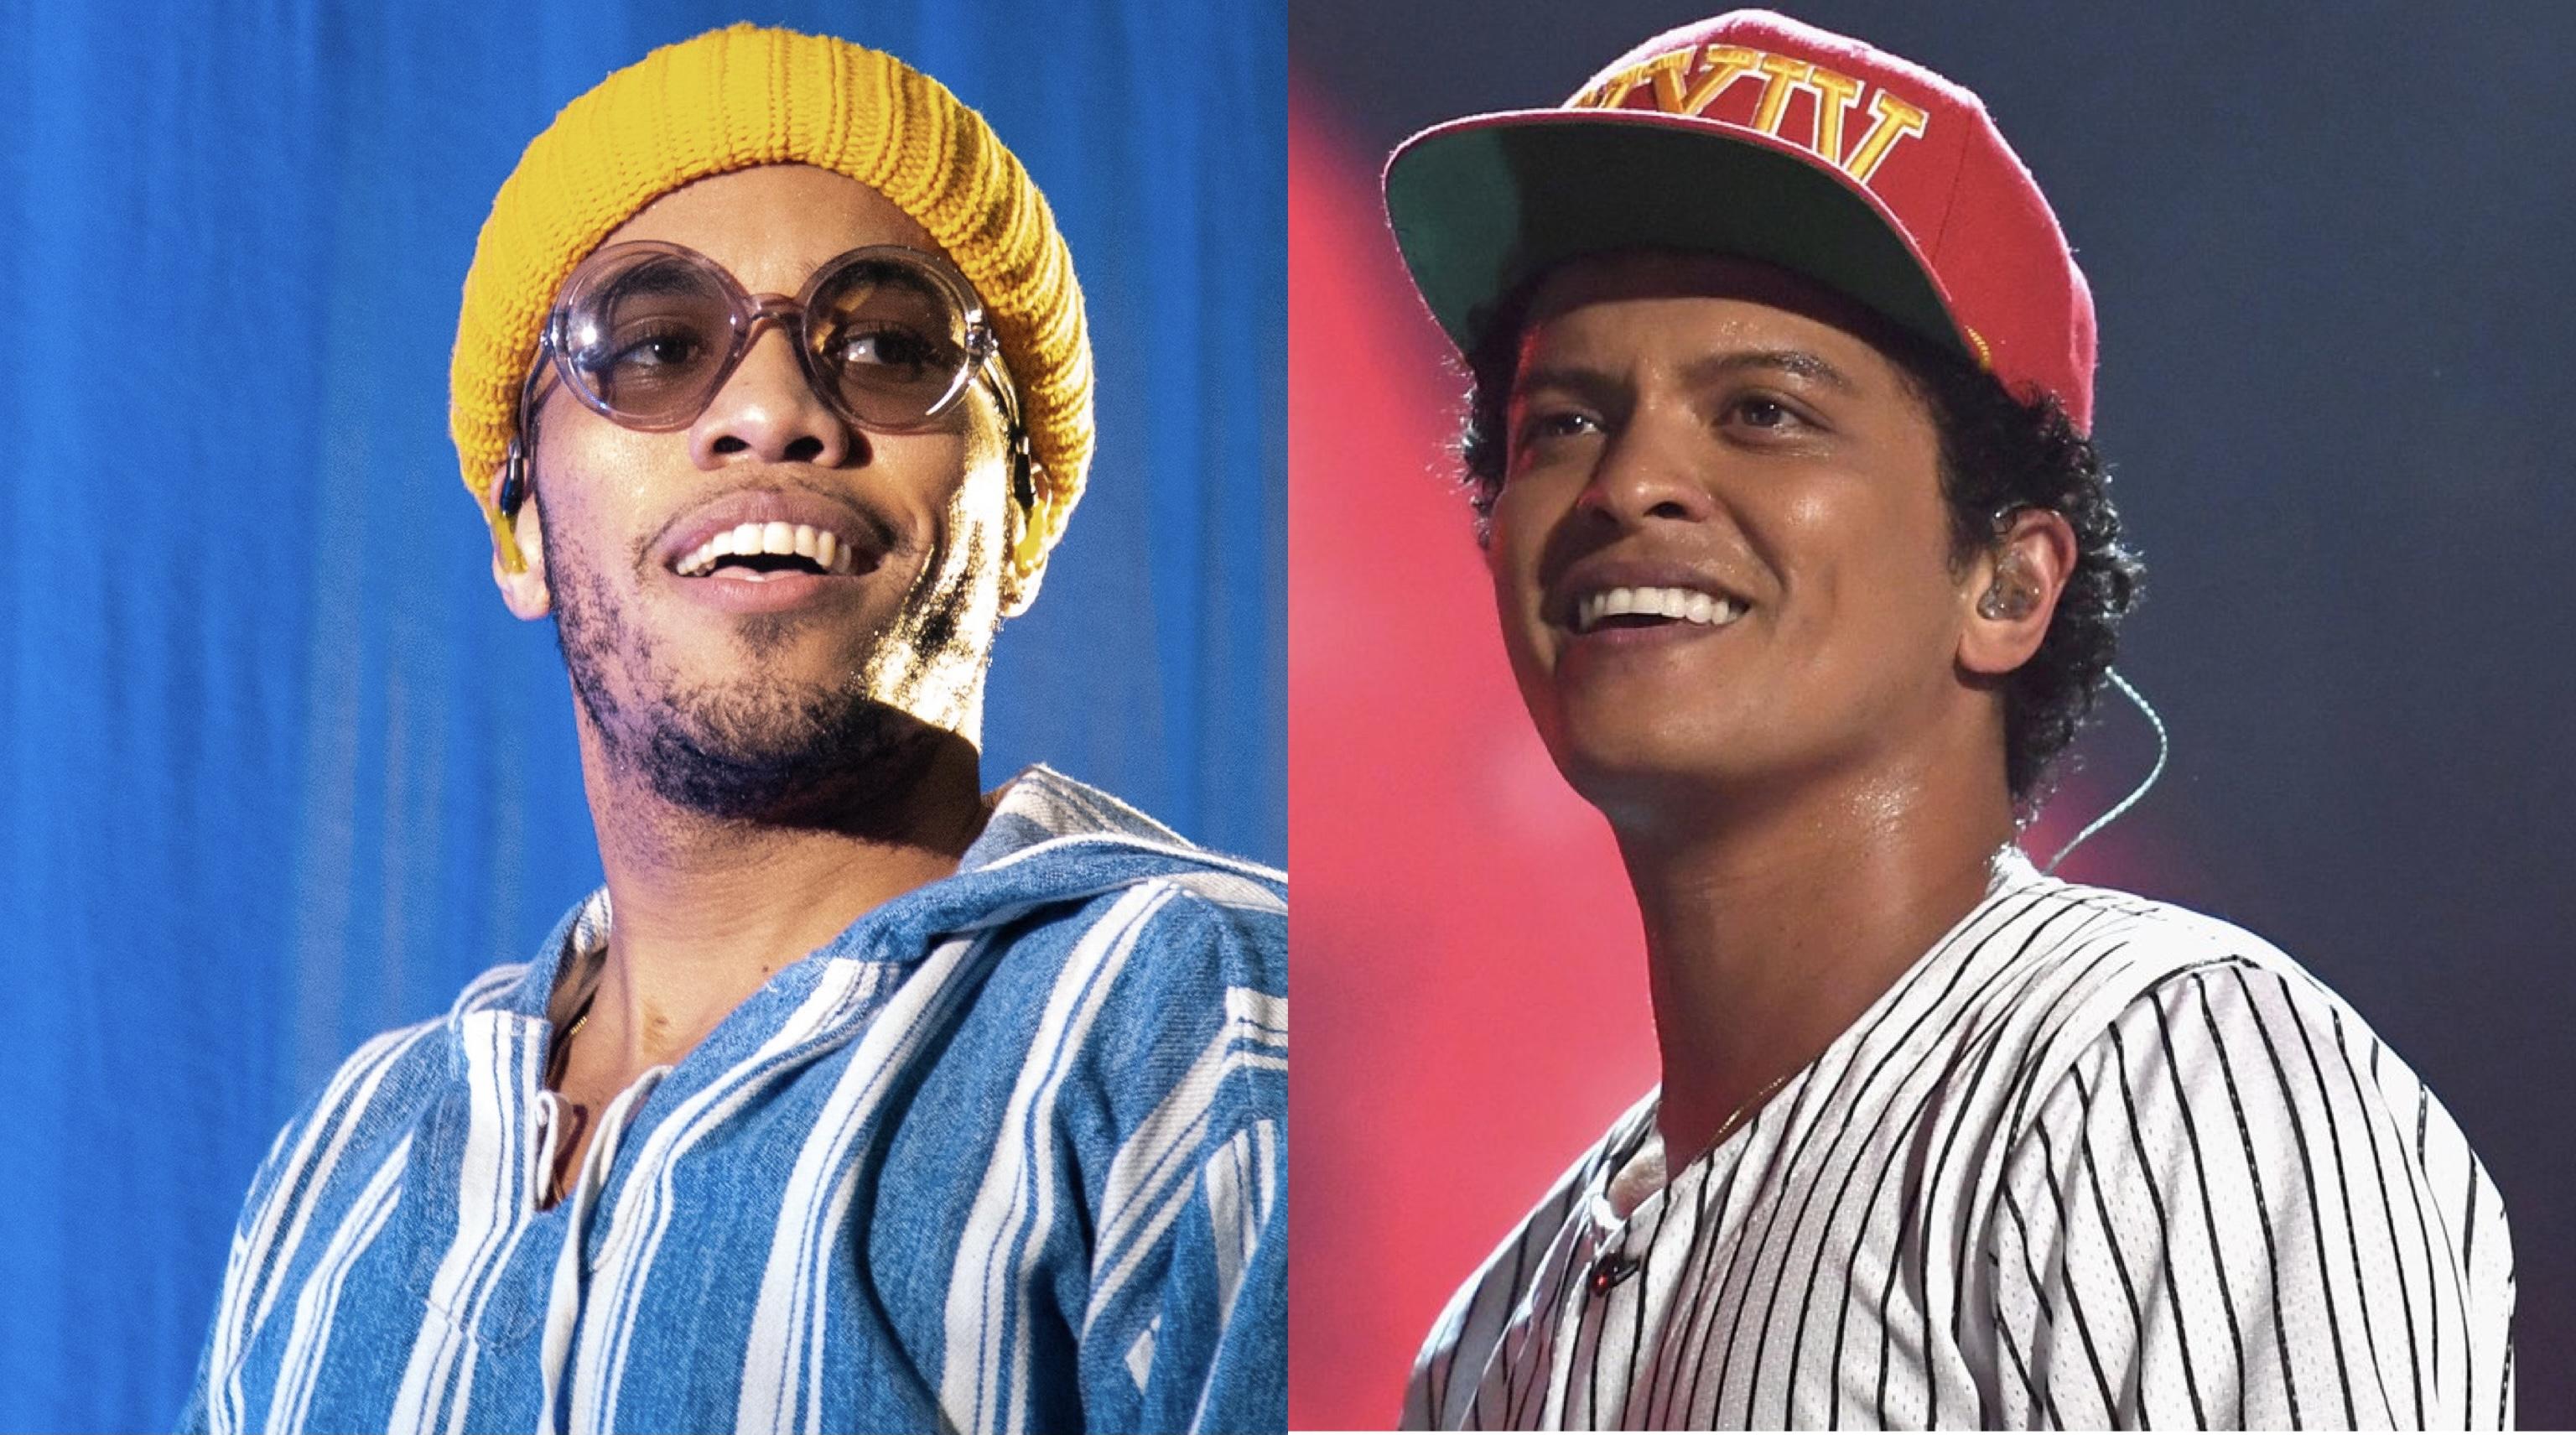 Anderson .Paak/ Bruno Mars